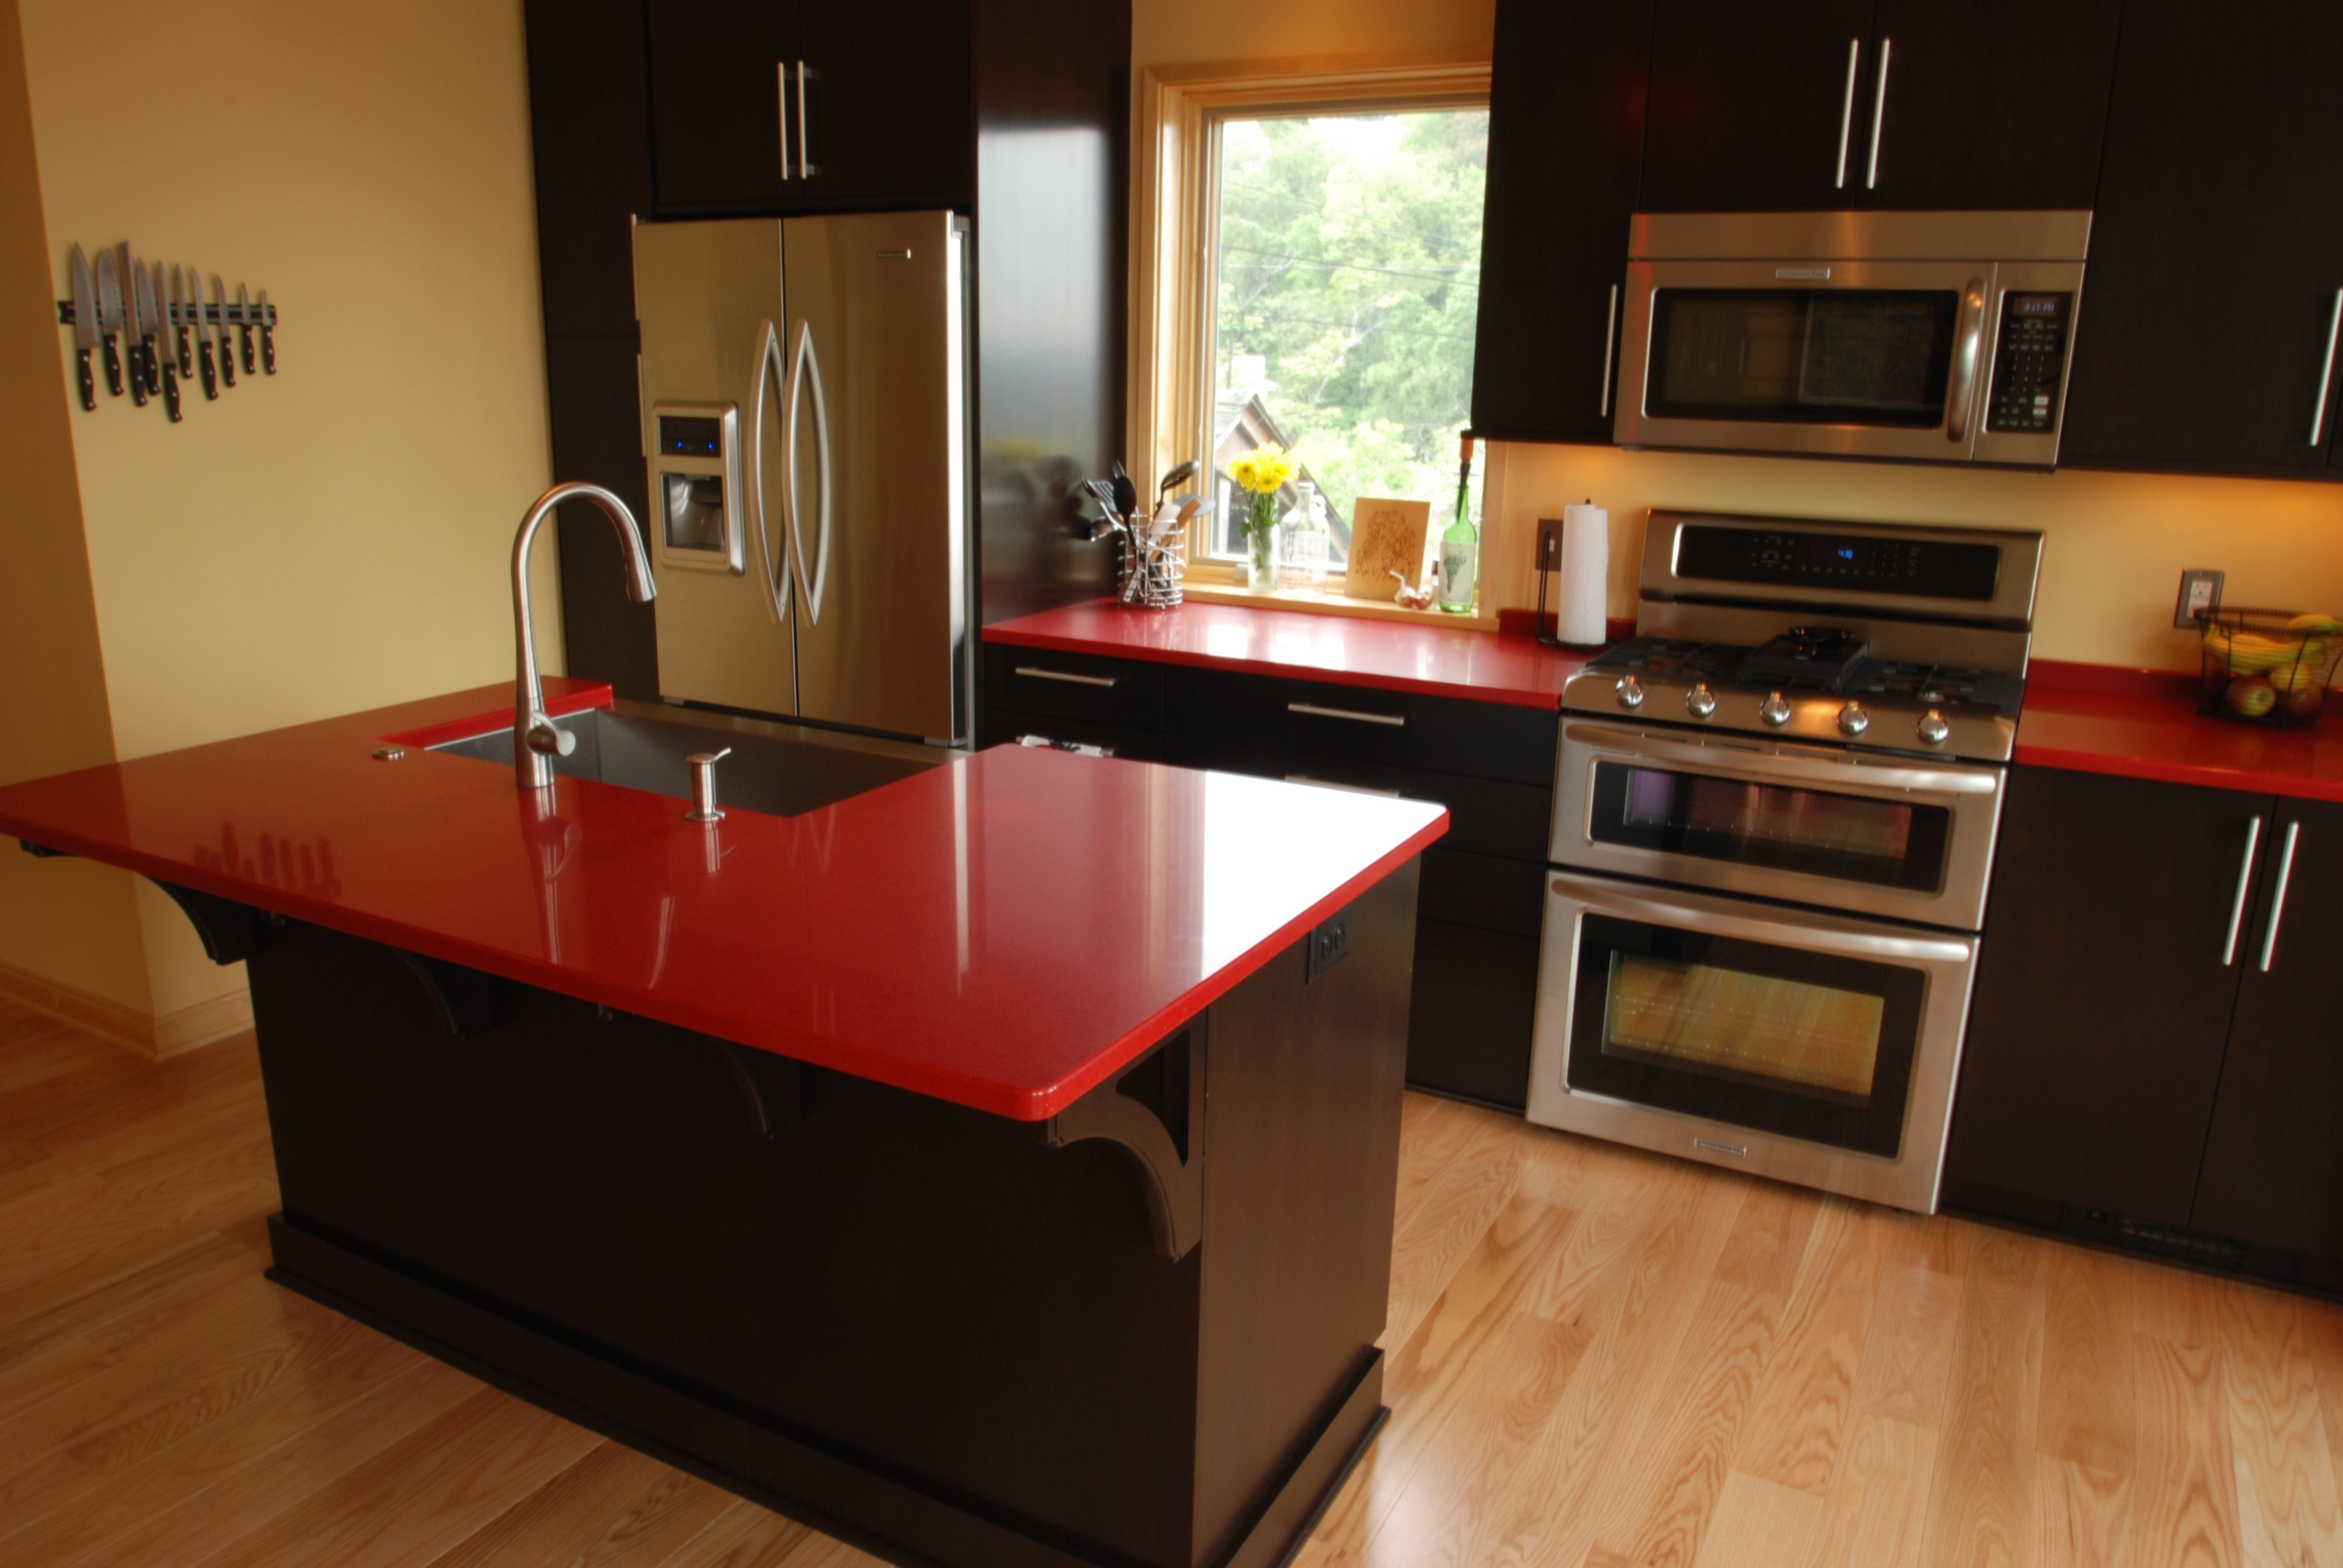 A Beautiful Kitchen With Quartz Countertops By Vangura Design Angelo Ociates